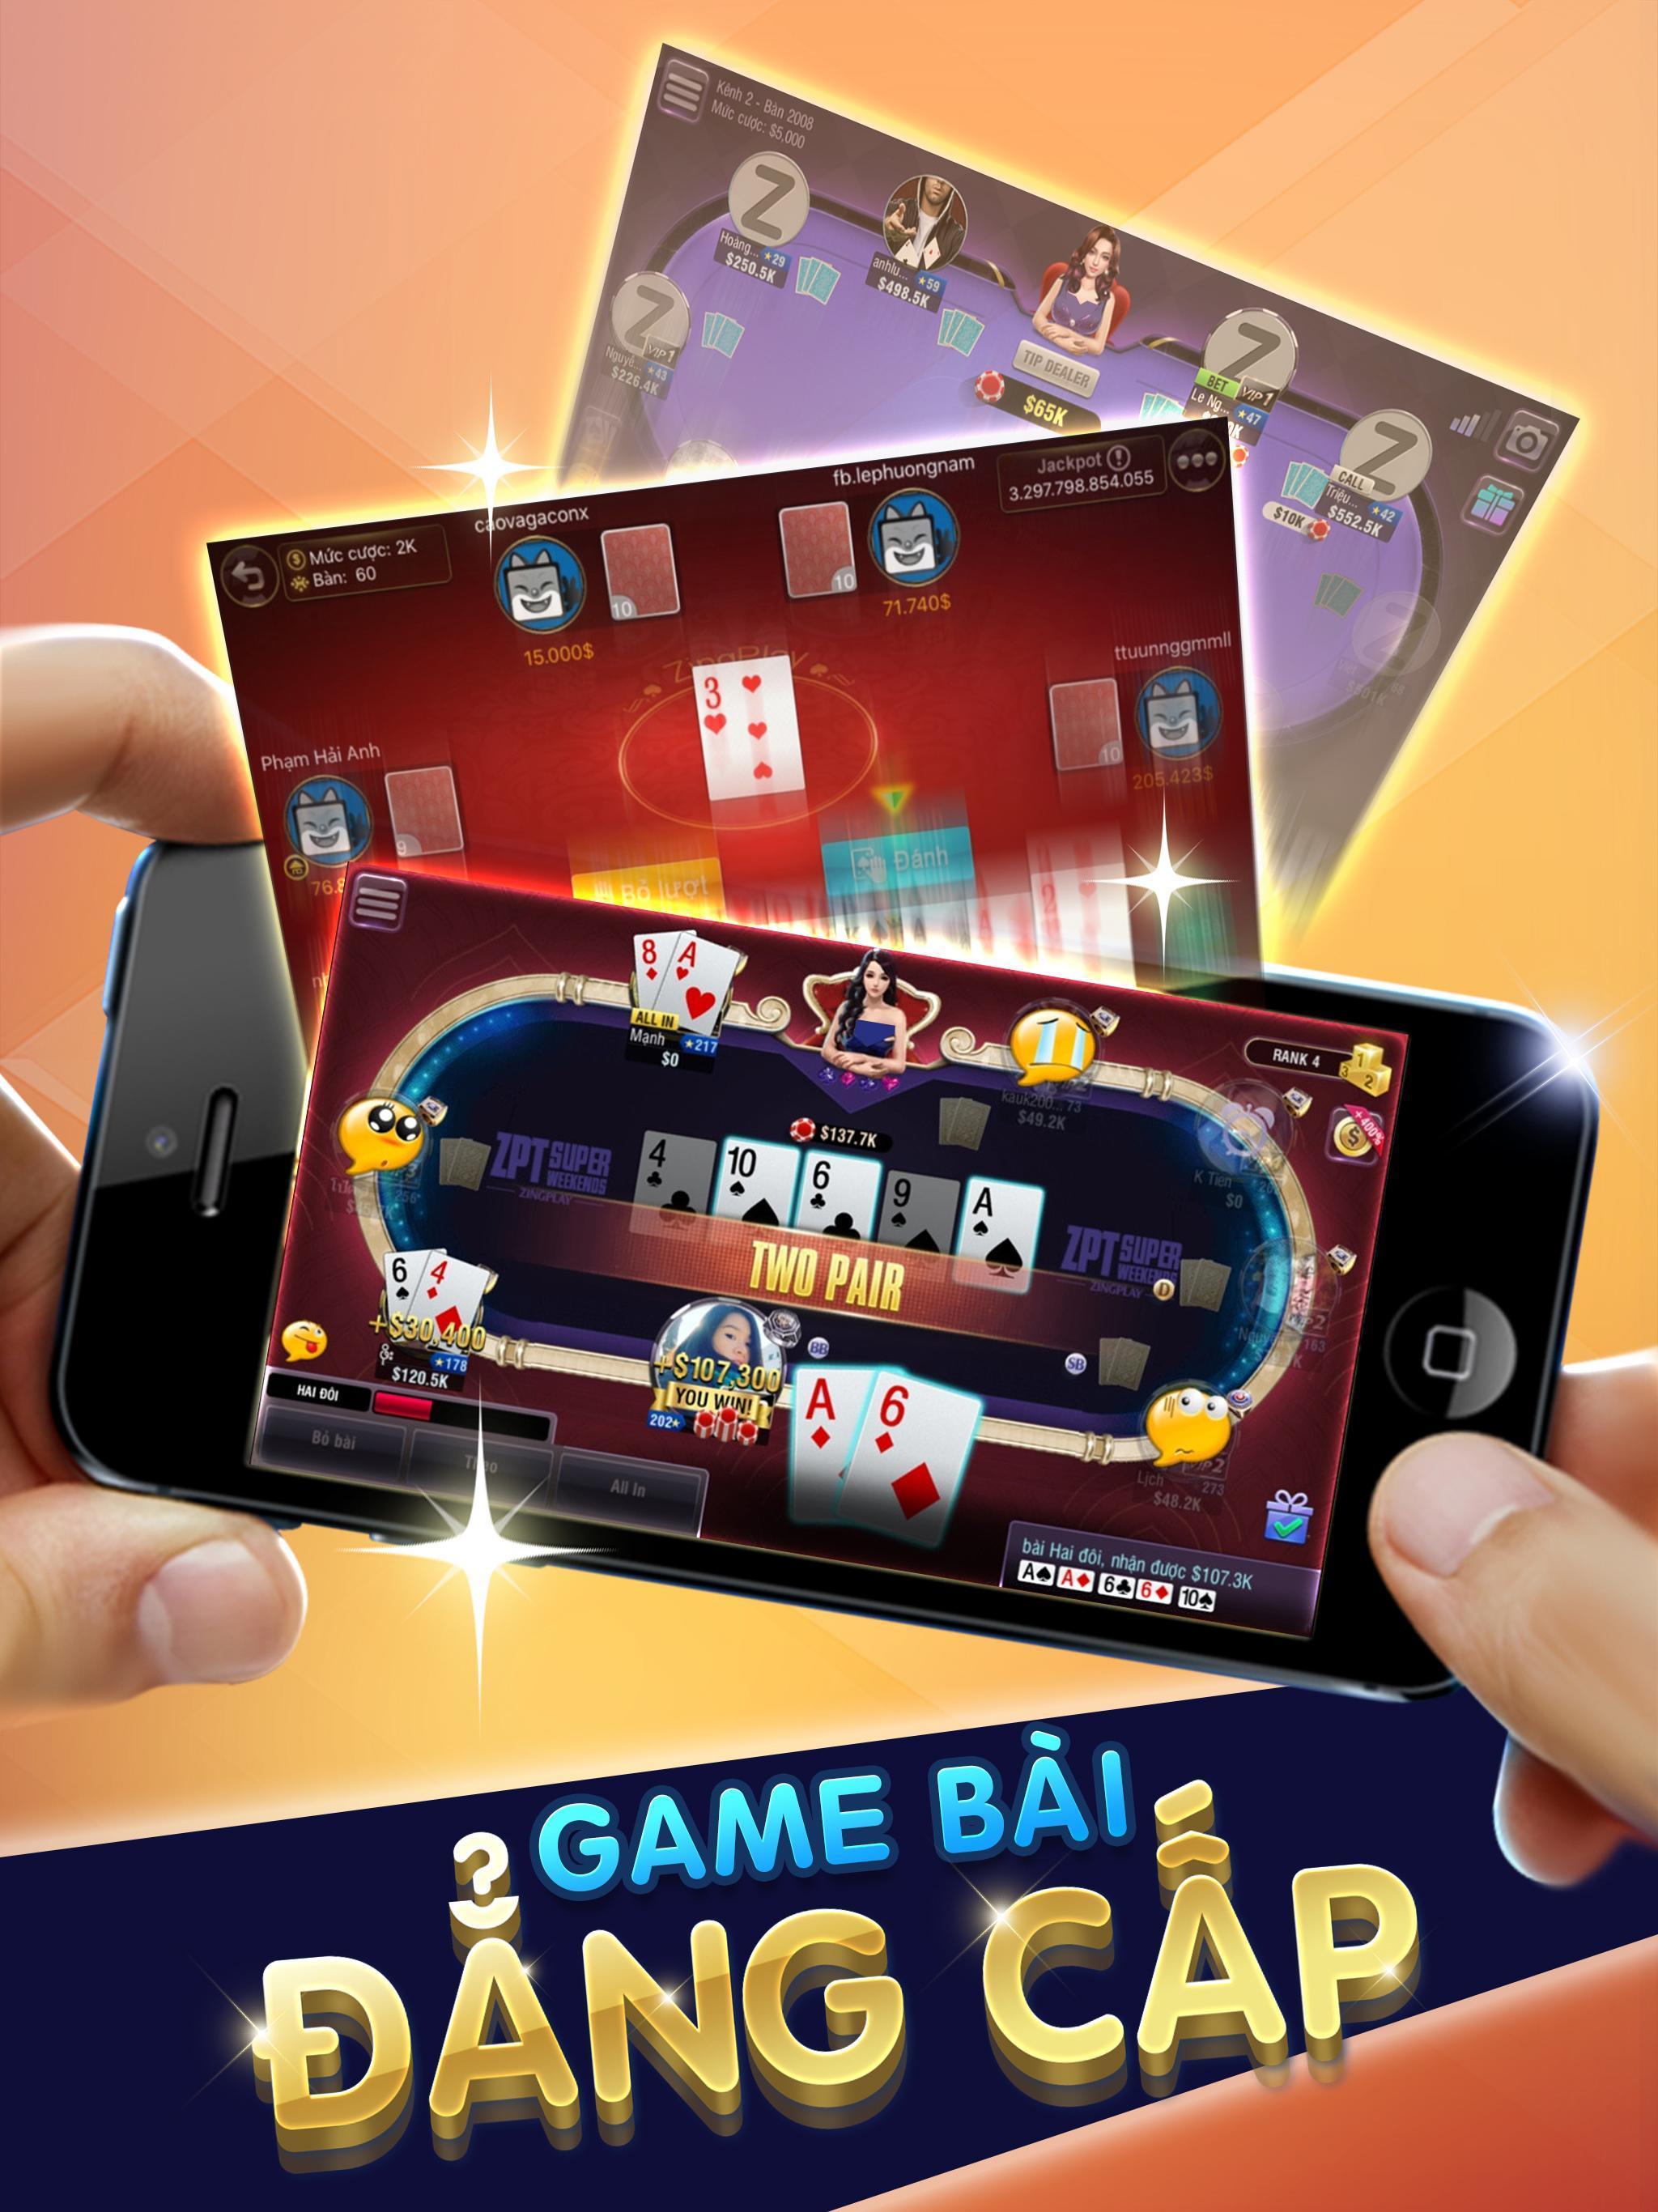 ZingPlay HD - Cổng game - Game Bài - Game Cờ 1.0.7 Screenshot 6